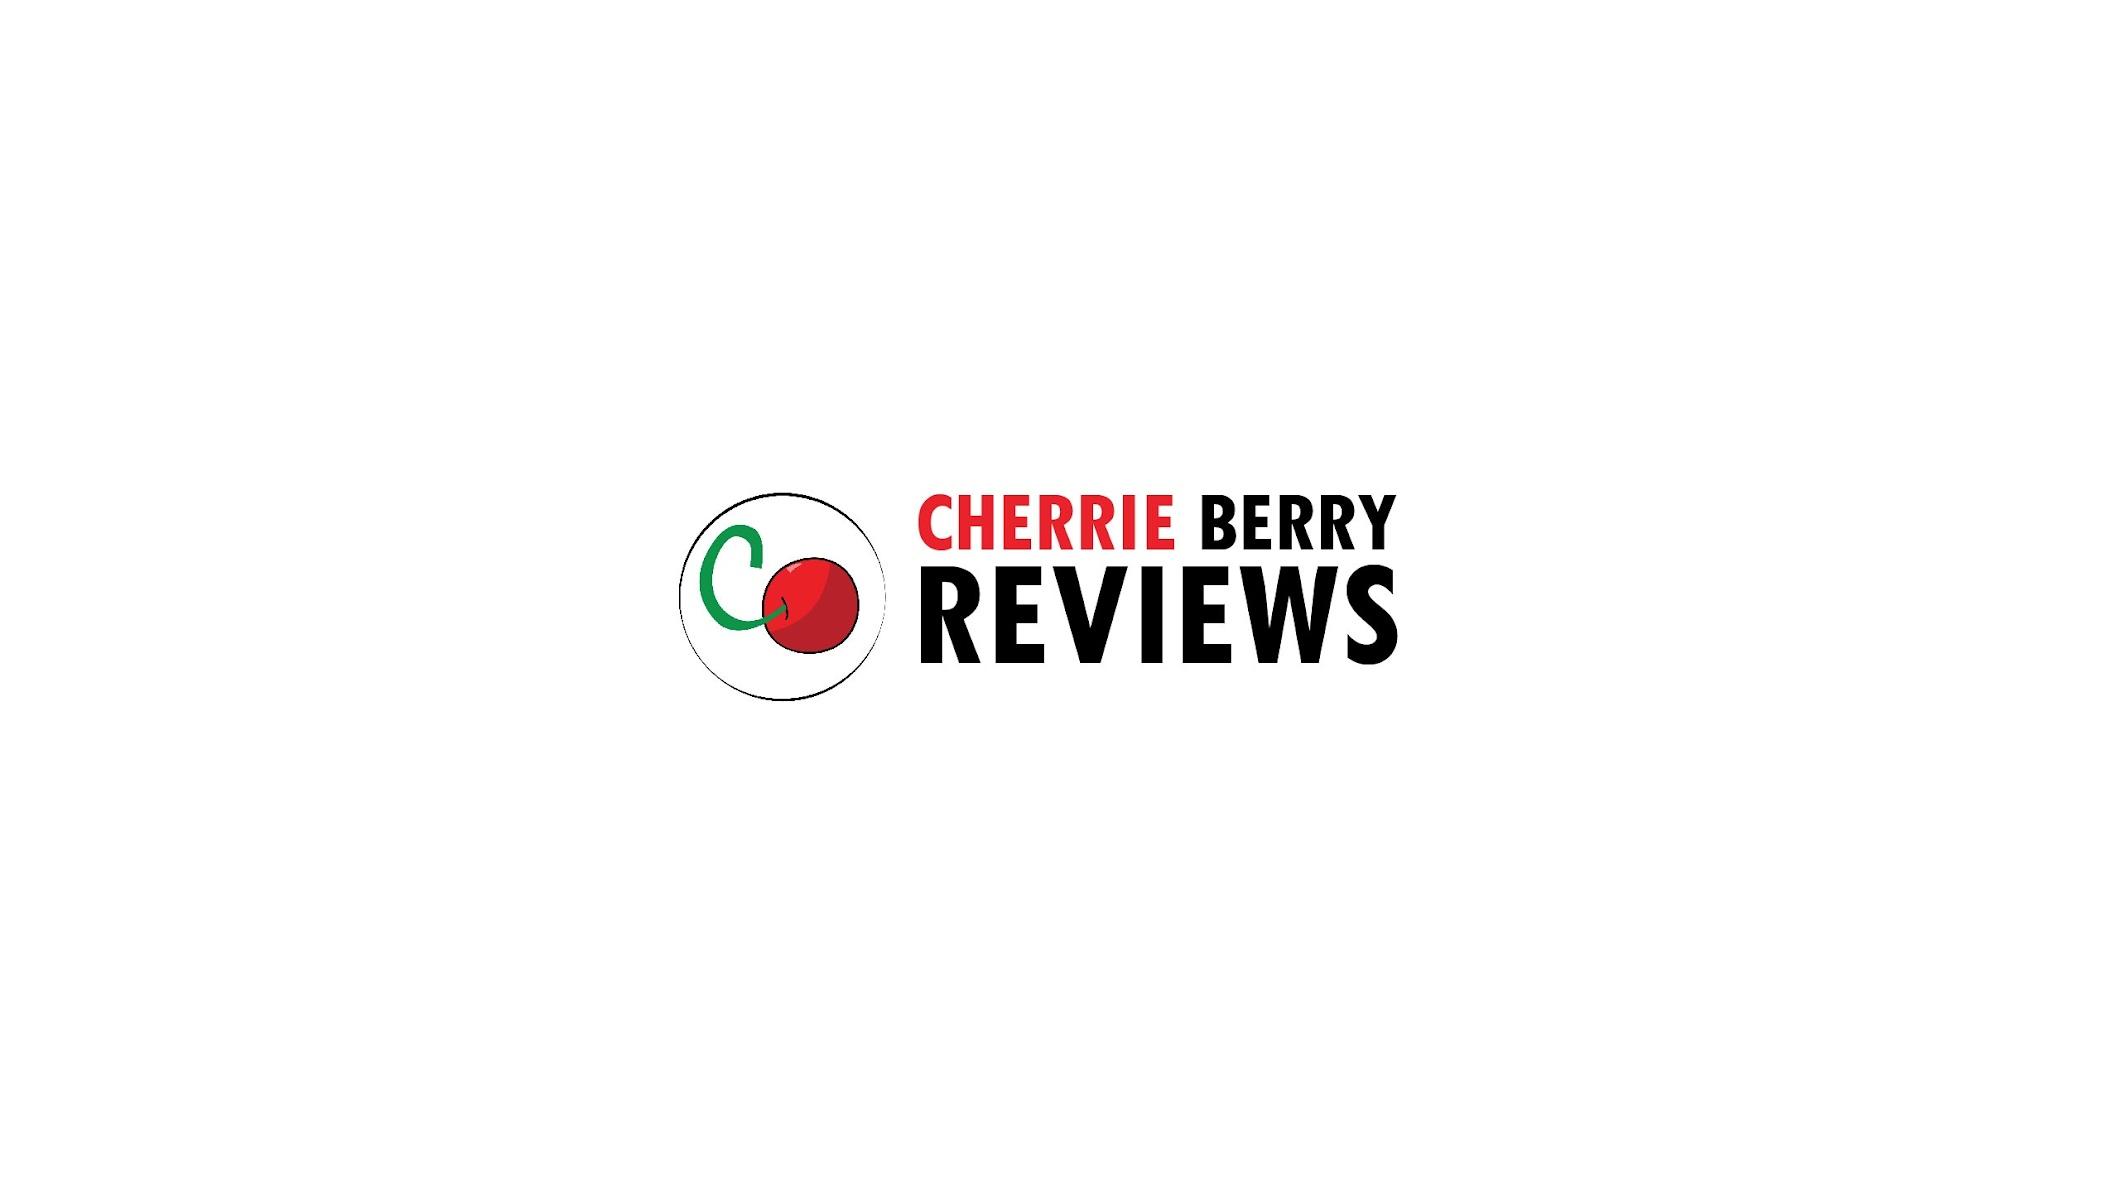 Cherrie Berry Reviews